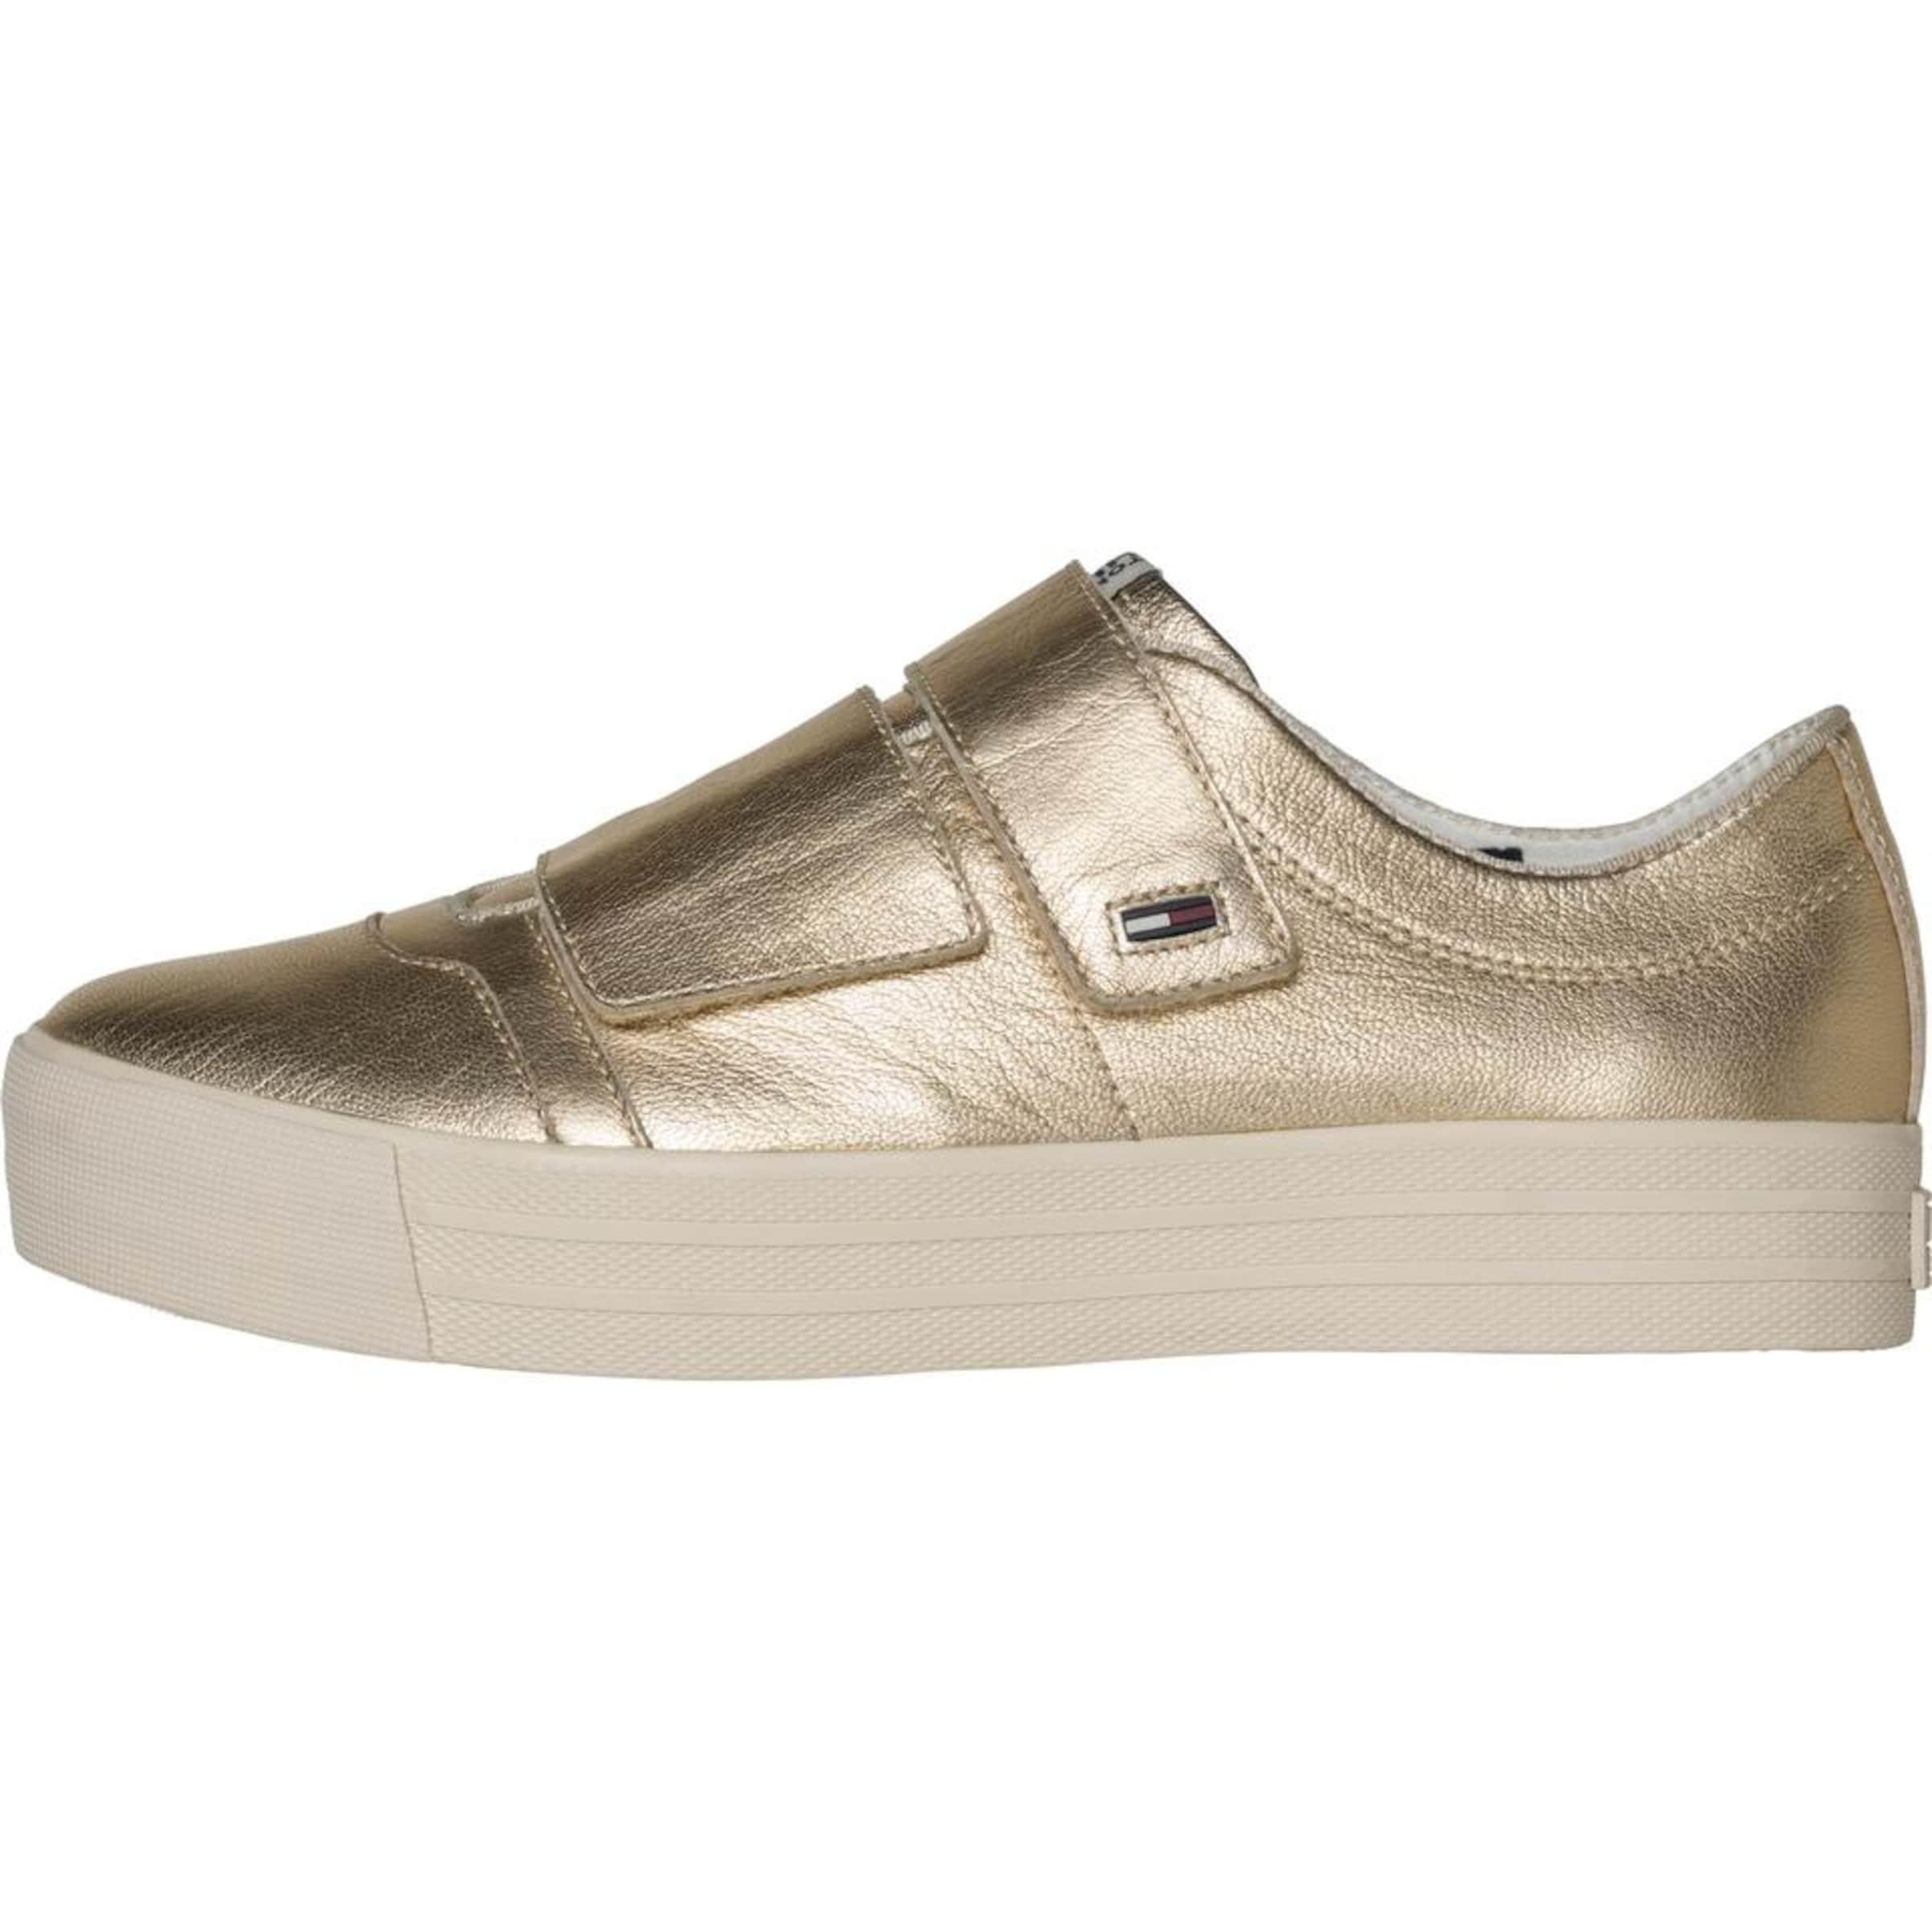 Haltbare Mode billige Schuhe TOMMY HILFIGER | Sneaker Schuhe Gut getragene Schuhe